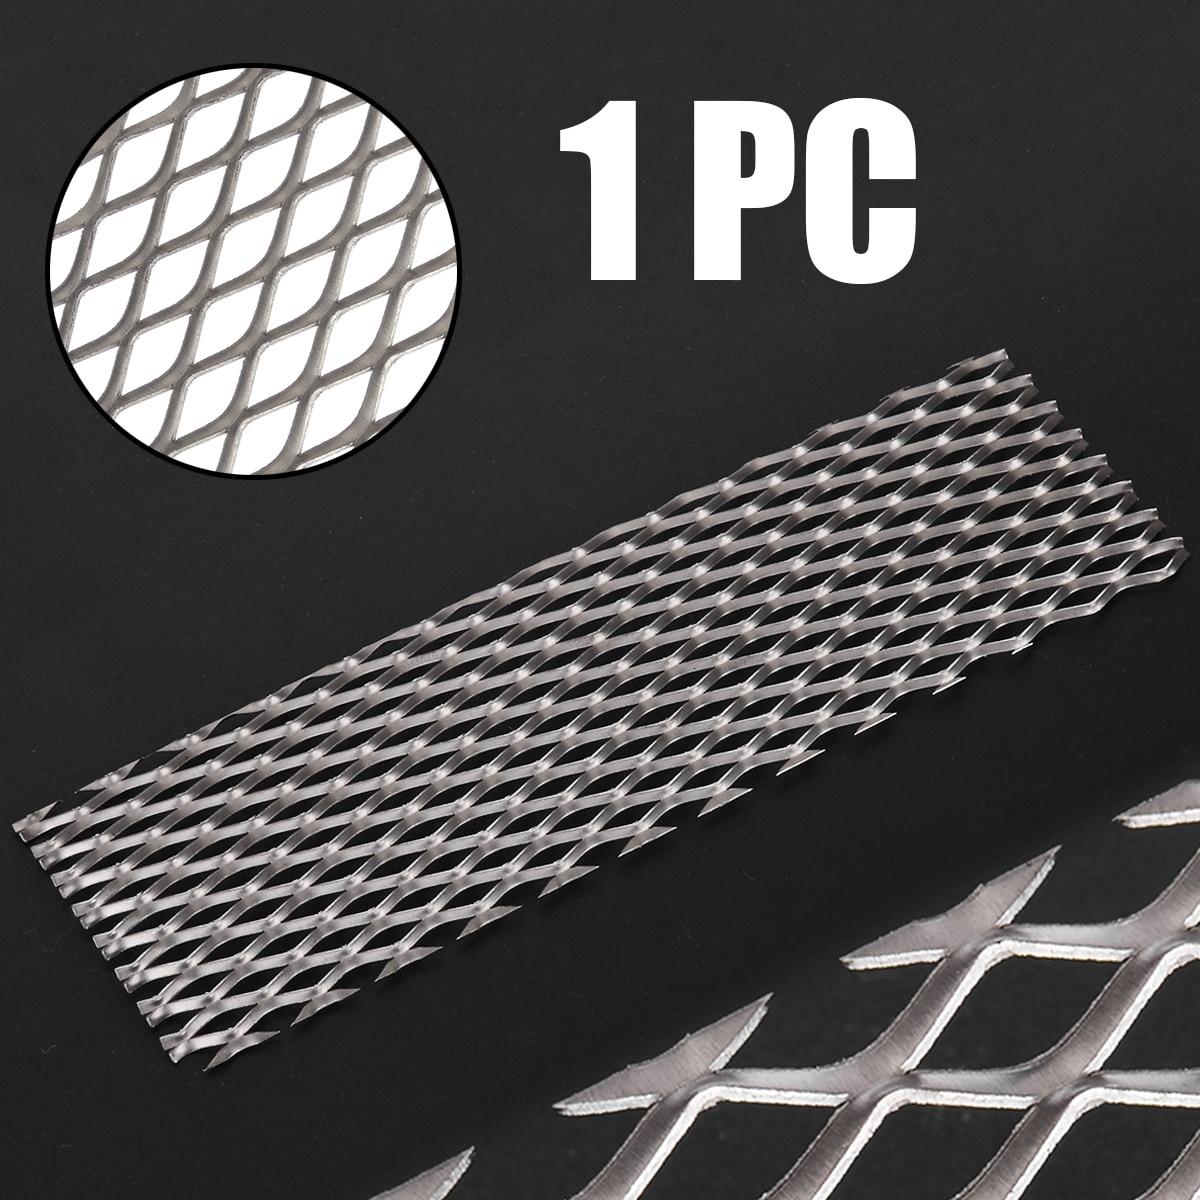 1pc New Titanium Mesh Sheet Heat Resistance Recycled Metal Mesh Electrode For Electrolysis 50mmx165mm